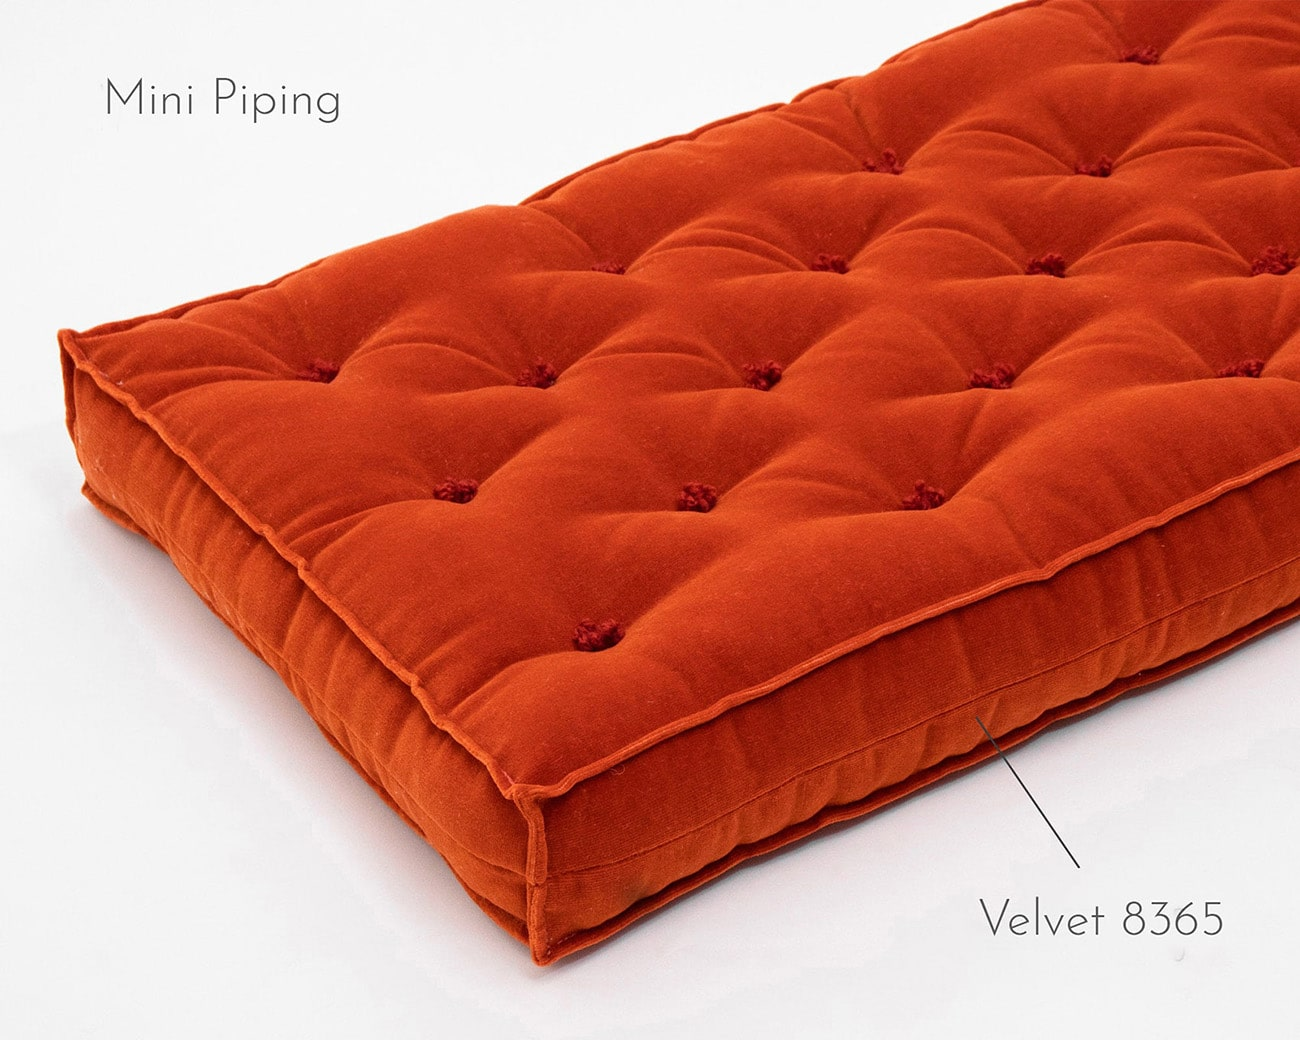 3 tufted cushion